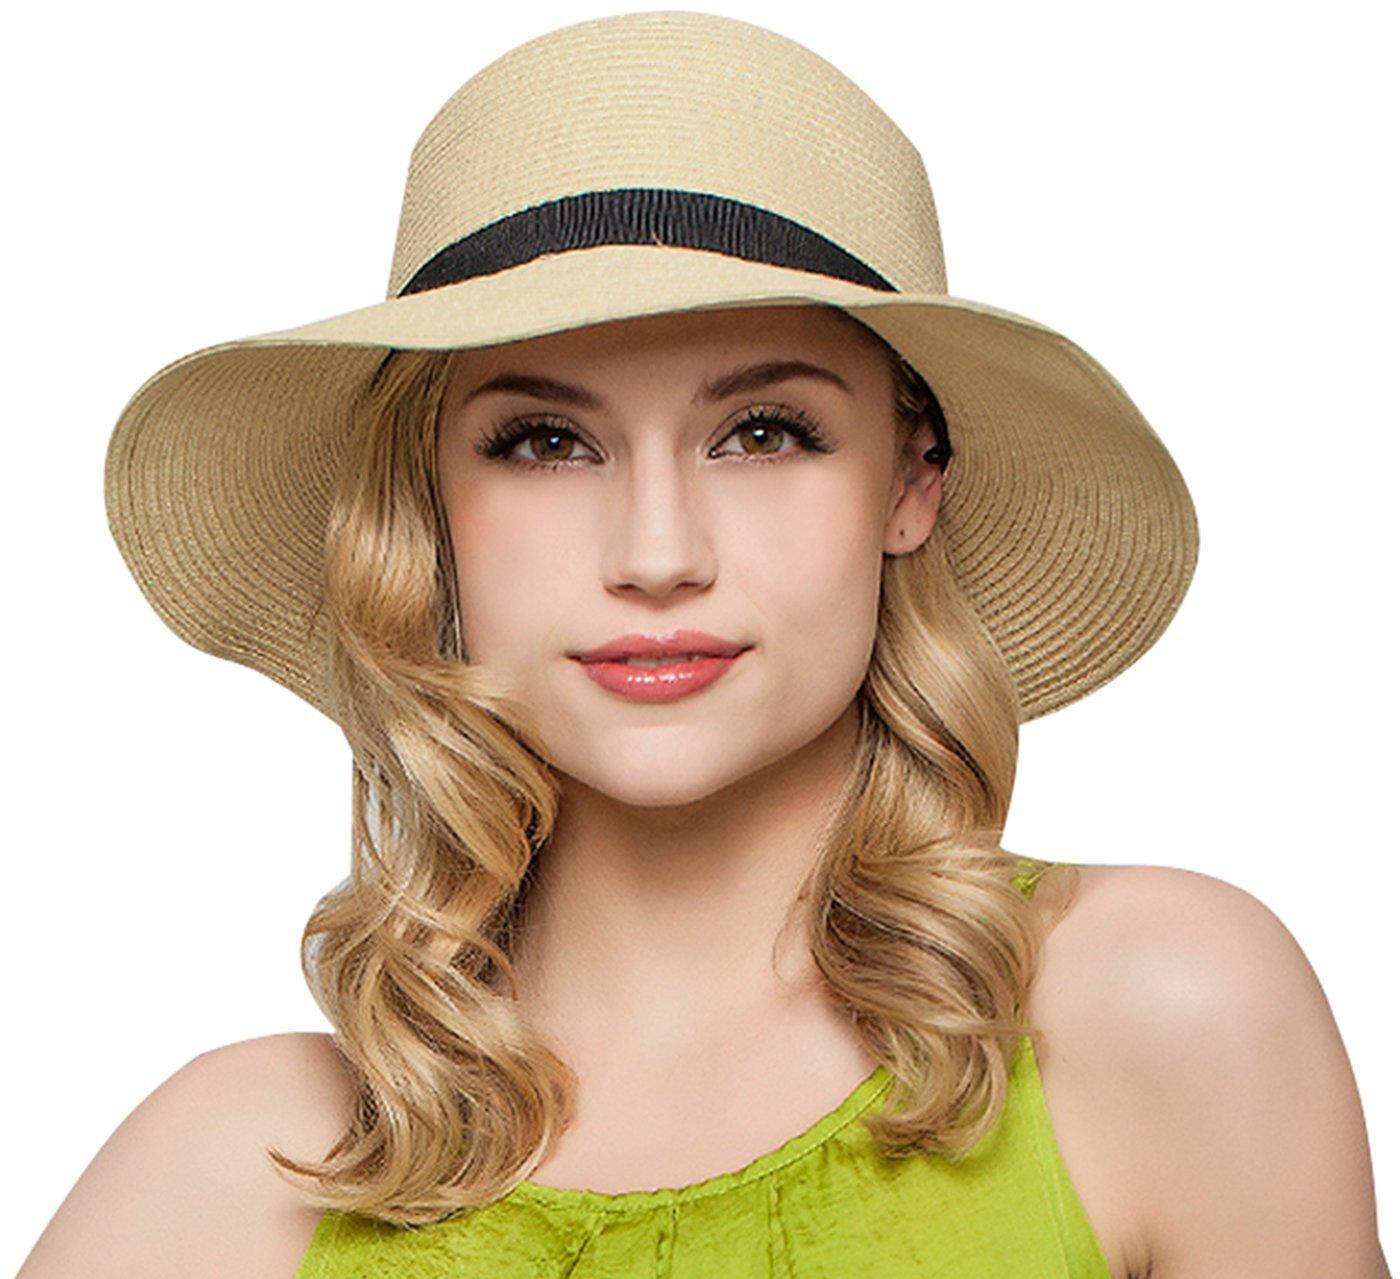 Janrely Women Floppy Sun Beach Straw Hats Wide Brim Packable Summer Cap (Beige)